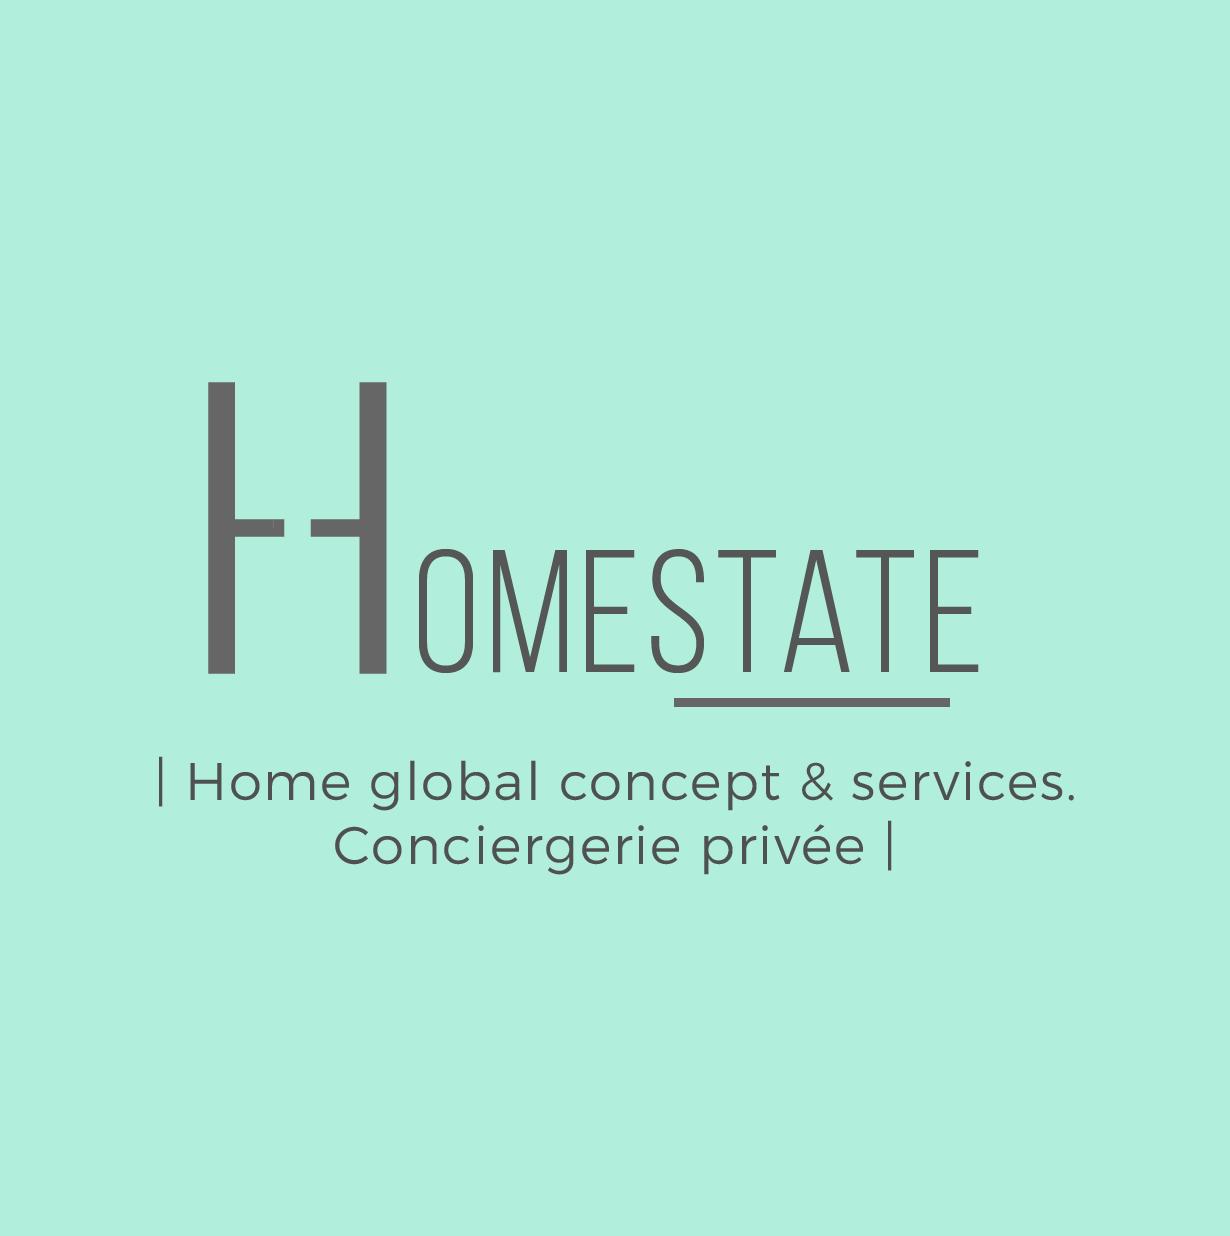 massage domicile de cannes monaco homestate conciergerie priv e. Black Bedroom Furniture Sets. Home Design Ideas